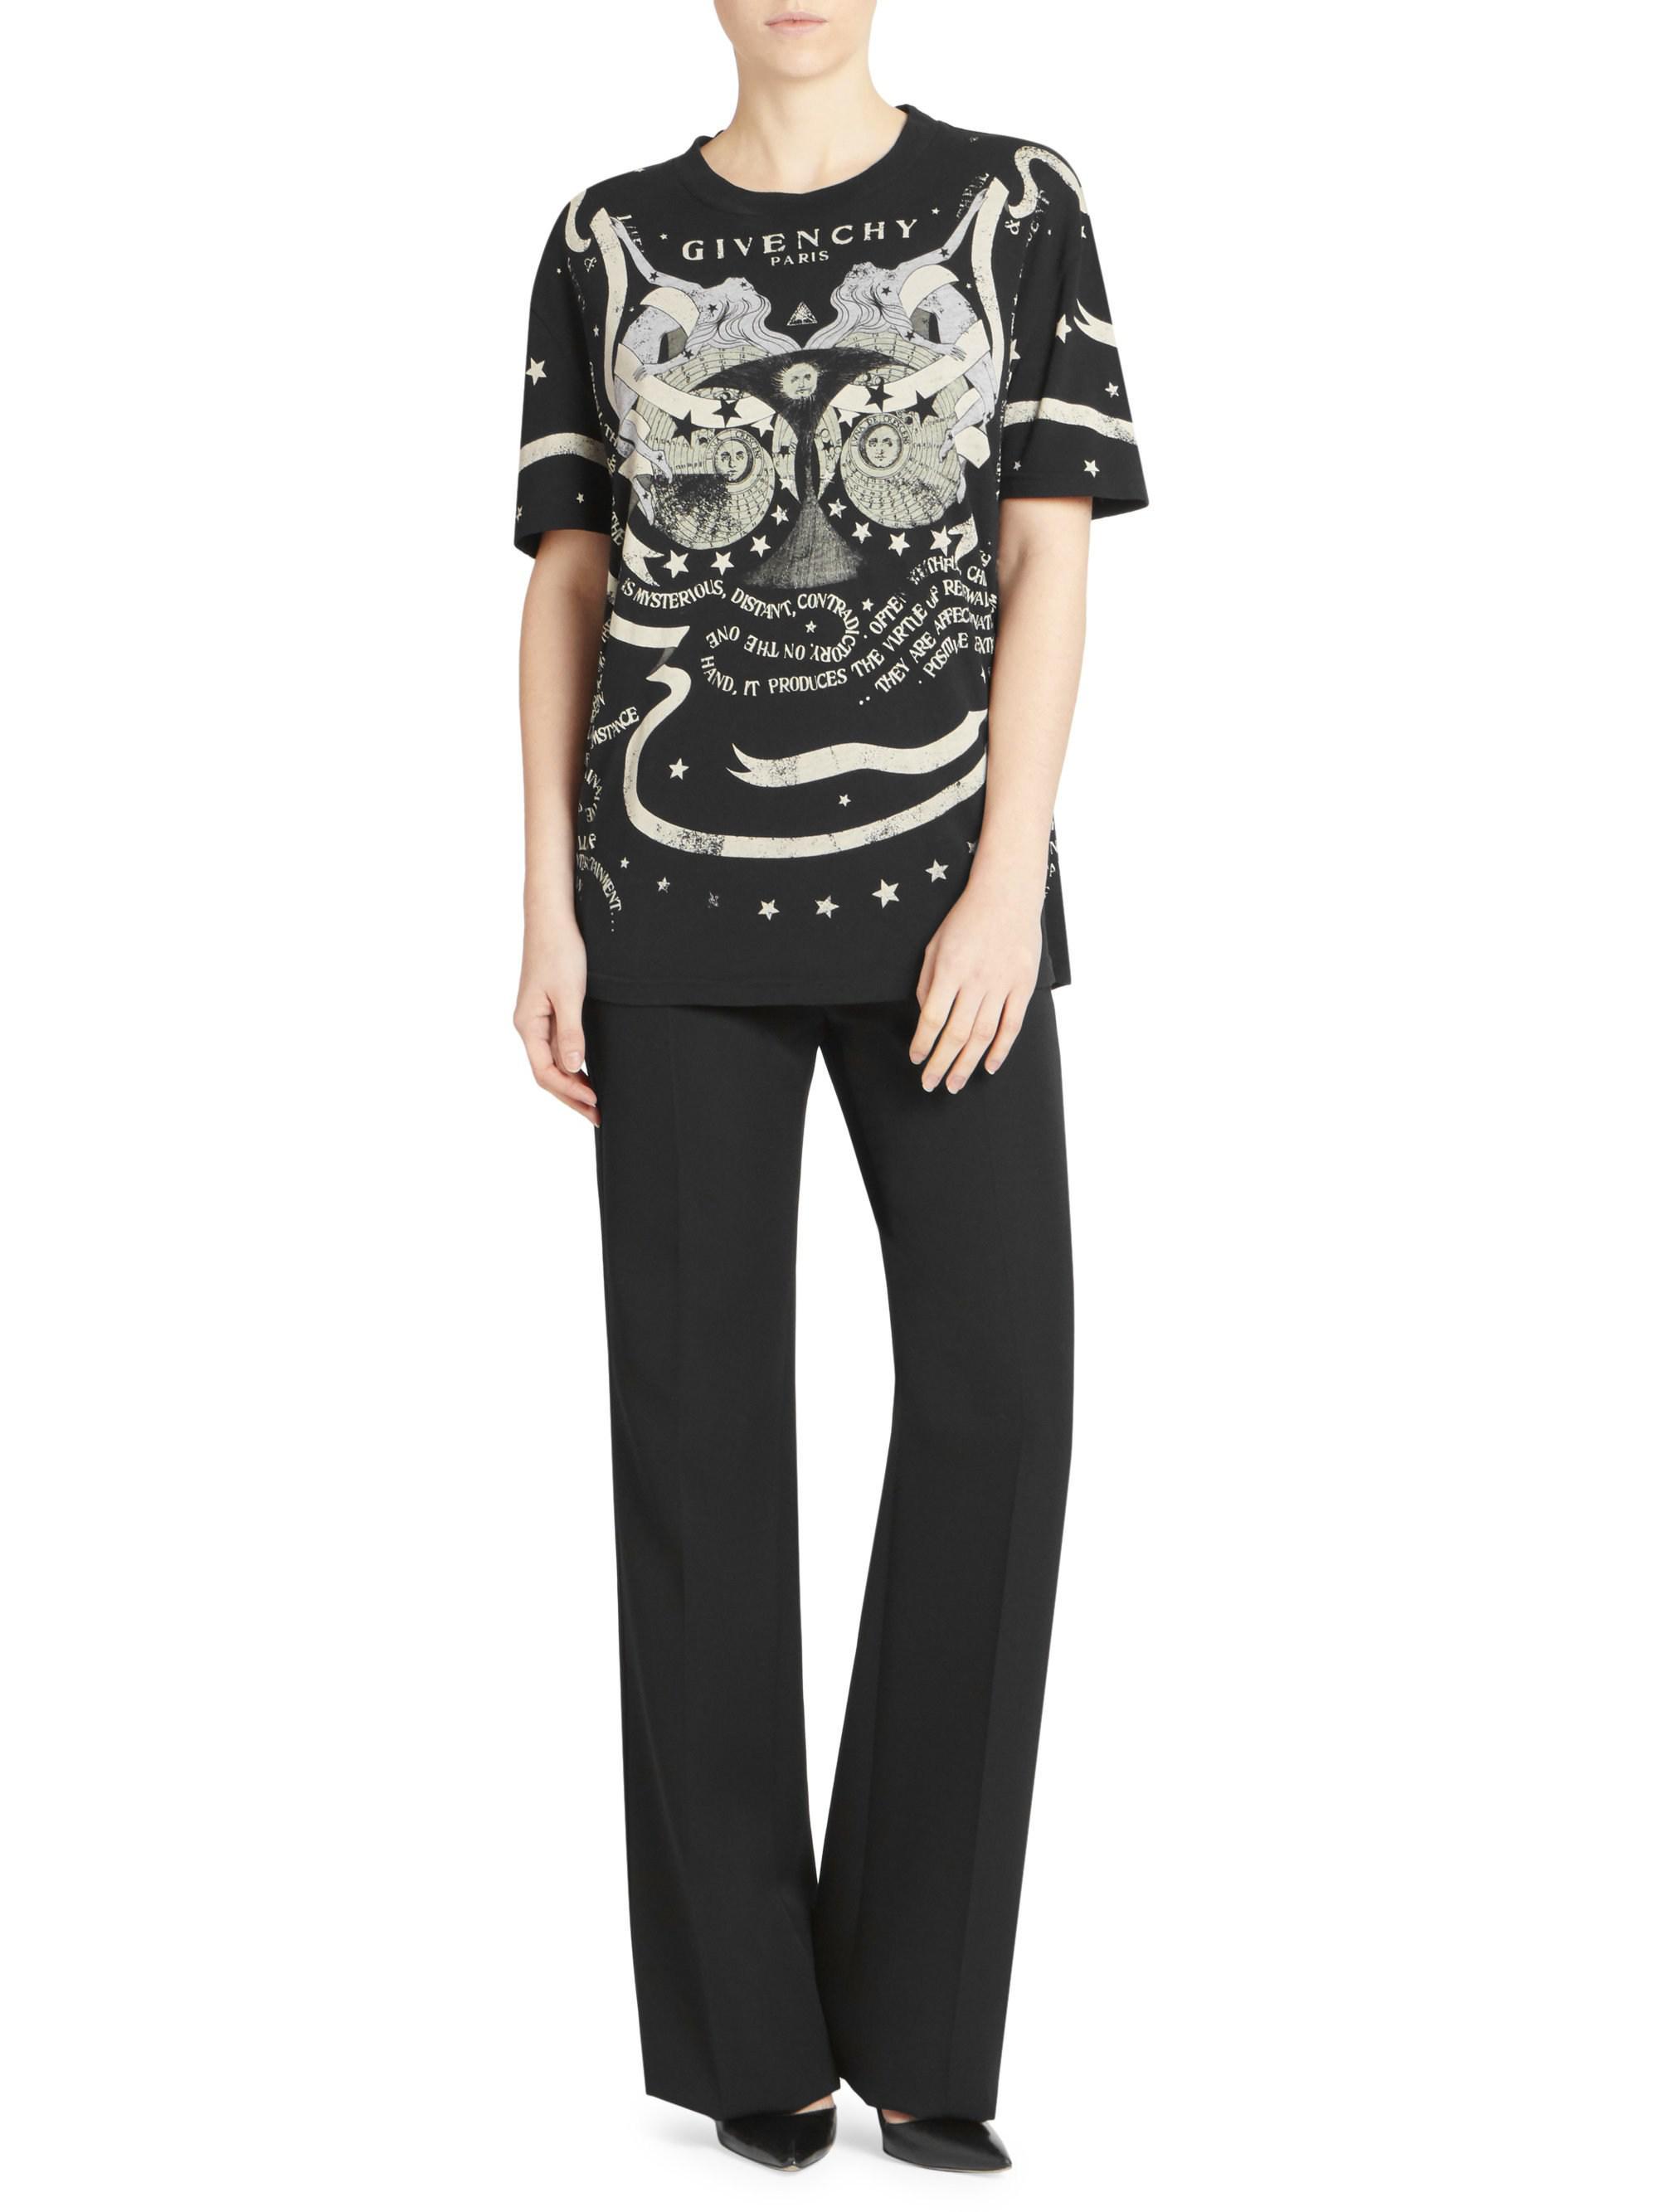 5e7b6d996 Givenchy Gemini T-shirt in Black - Lyst